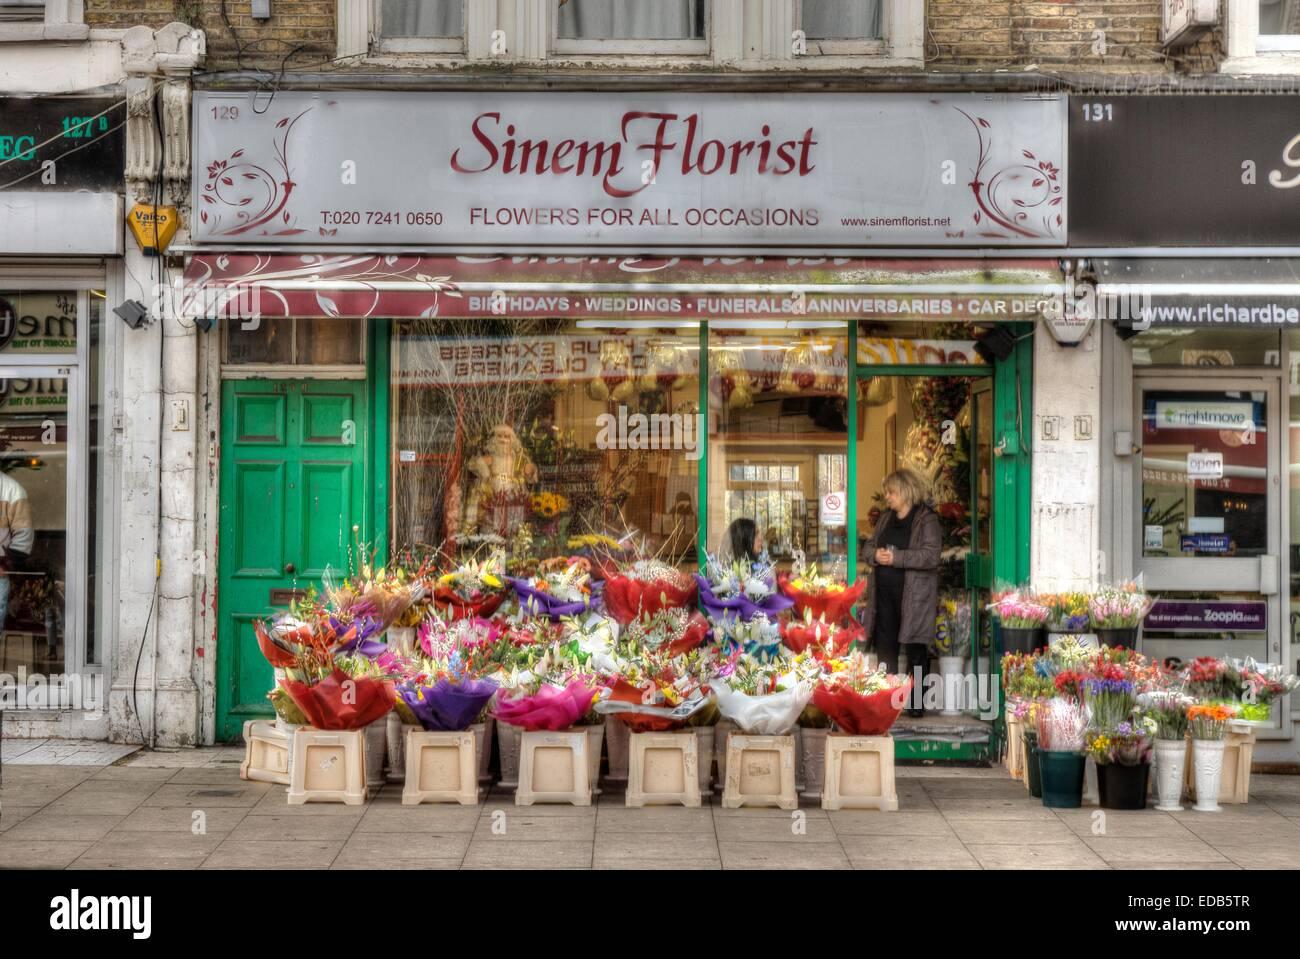 interflora london uk: